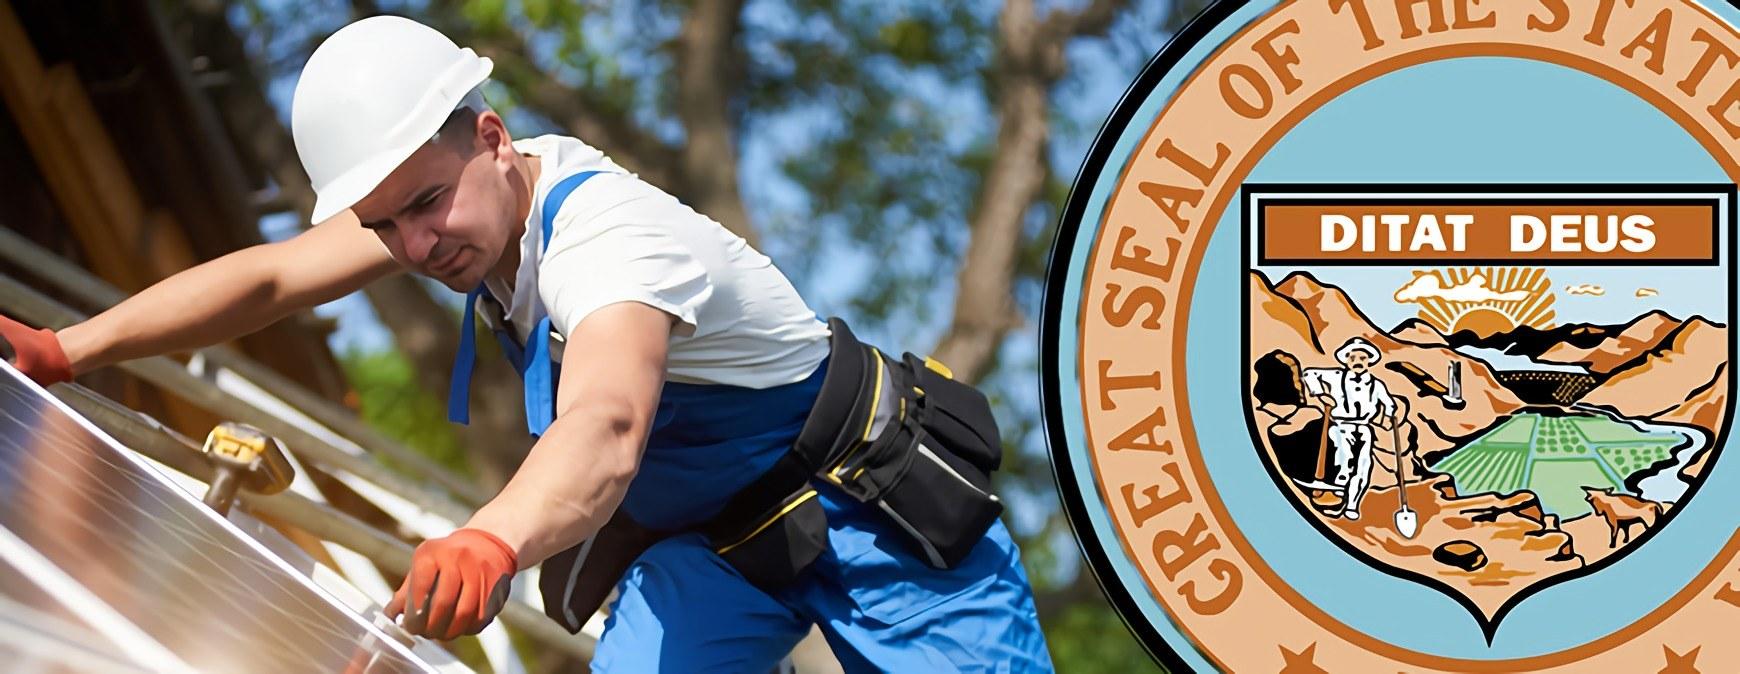 arizona skilled jobs with state seal